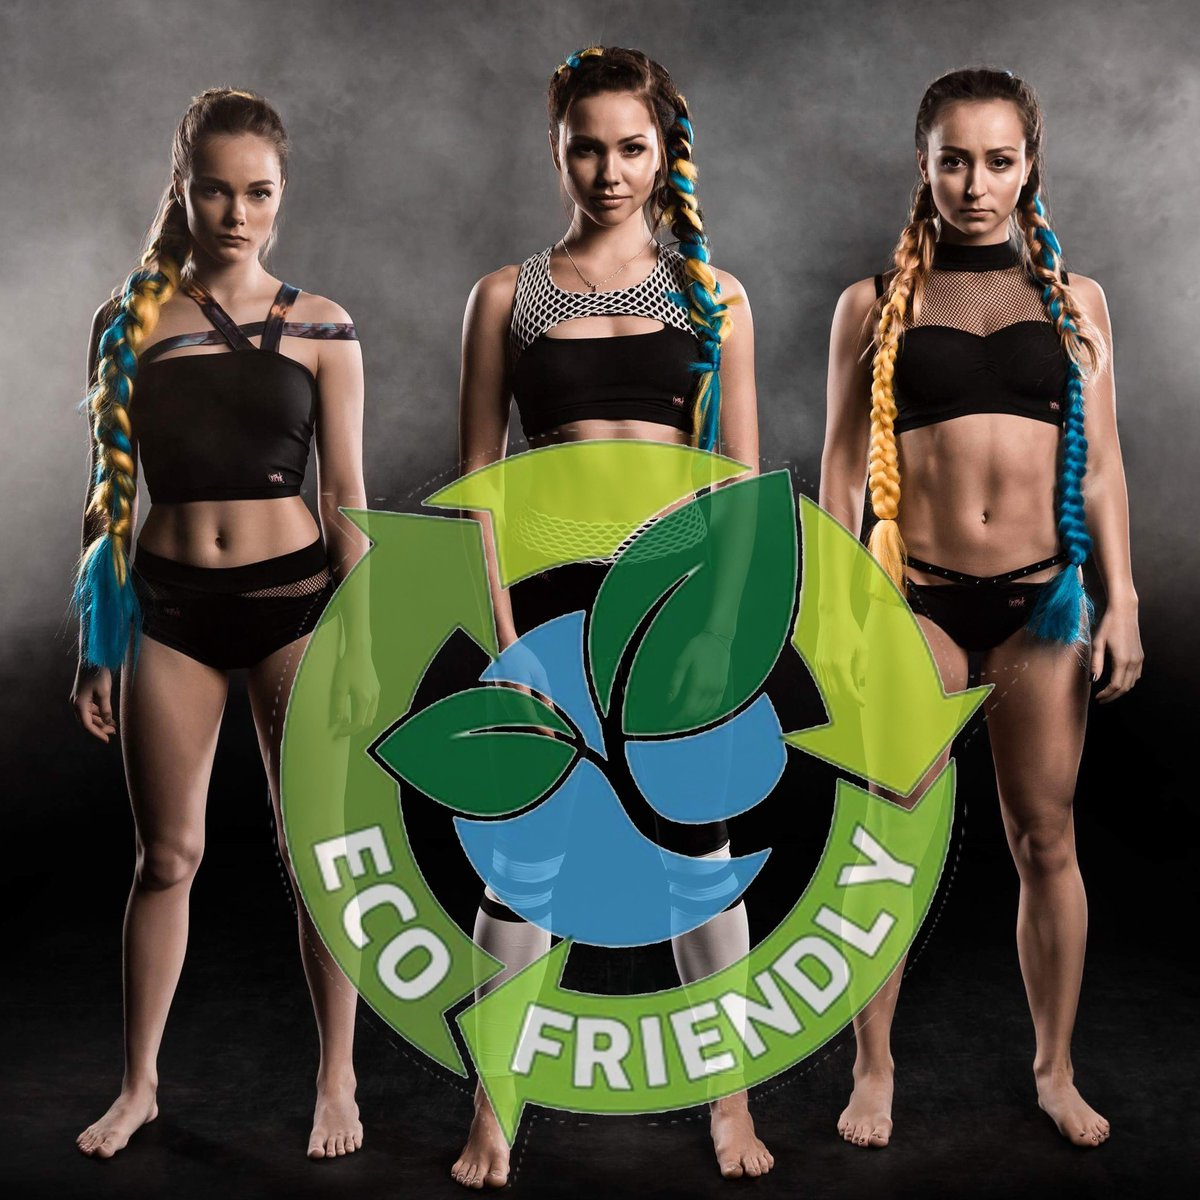 NEW BLOG How Eco Friendly Are Wink? https://t.co/0SwO9ol89I #ecofriendly #ecofriendlyfashion #recycledfabrics #fashion #poleclothing #aerial #poledance #polewear #aerialoutfits #aerialclothing #fitnessfashion #loveyourplanet #recycling #fastfashion #disposablefashion #ecofashion https://t.co/jWuSAS4Cnv